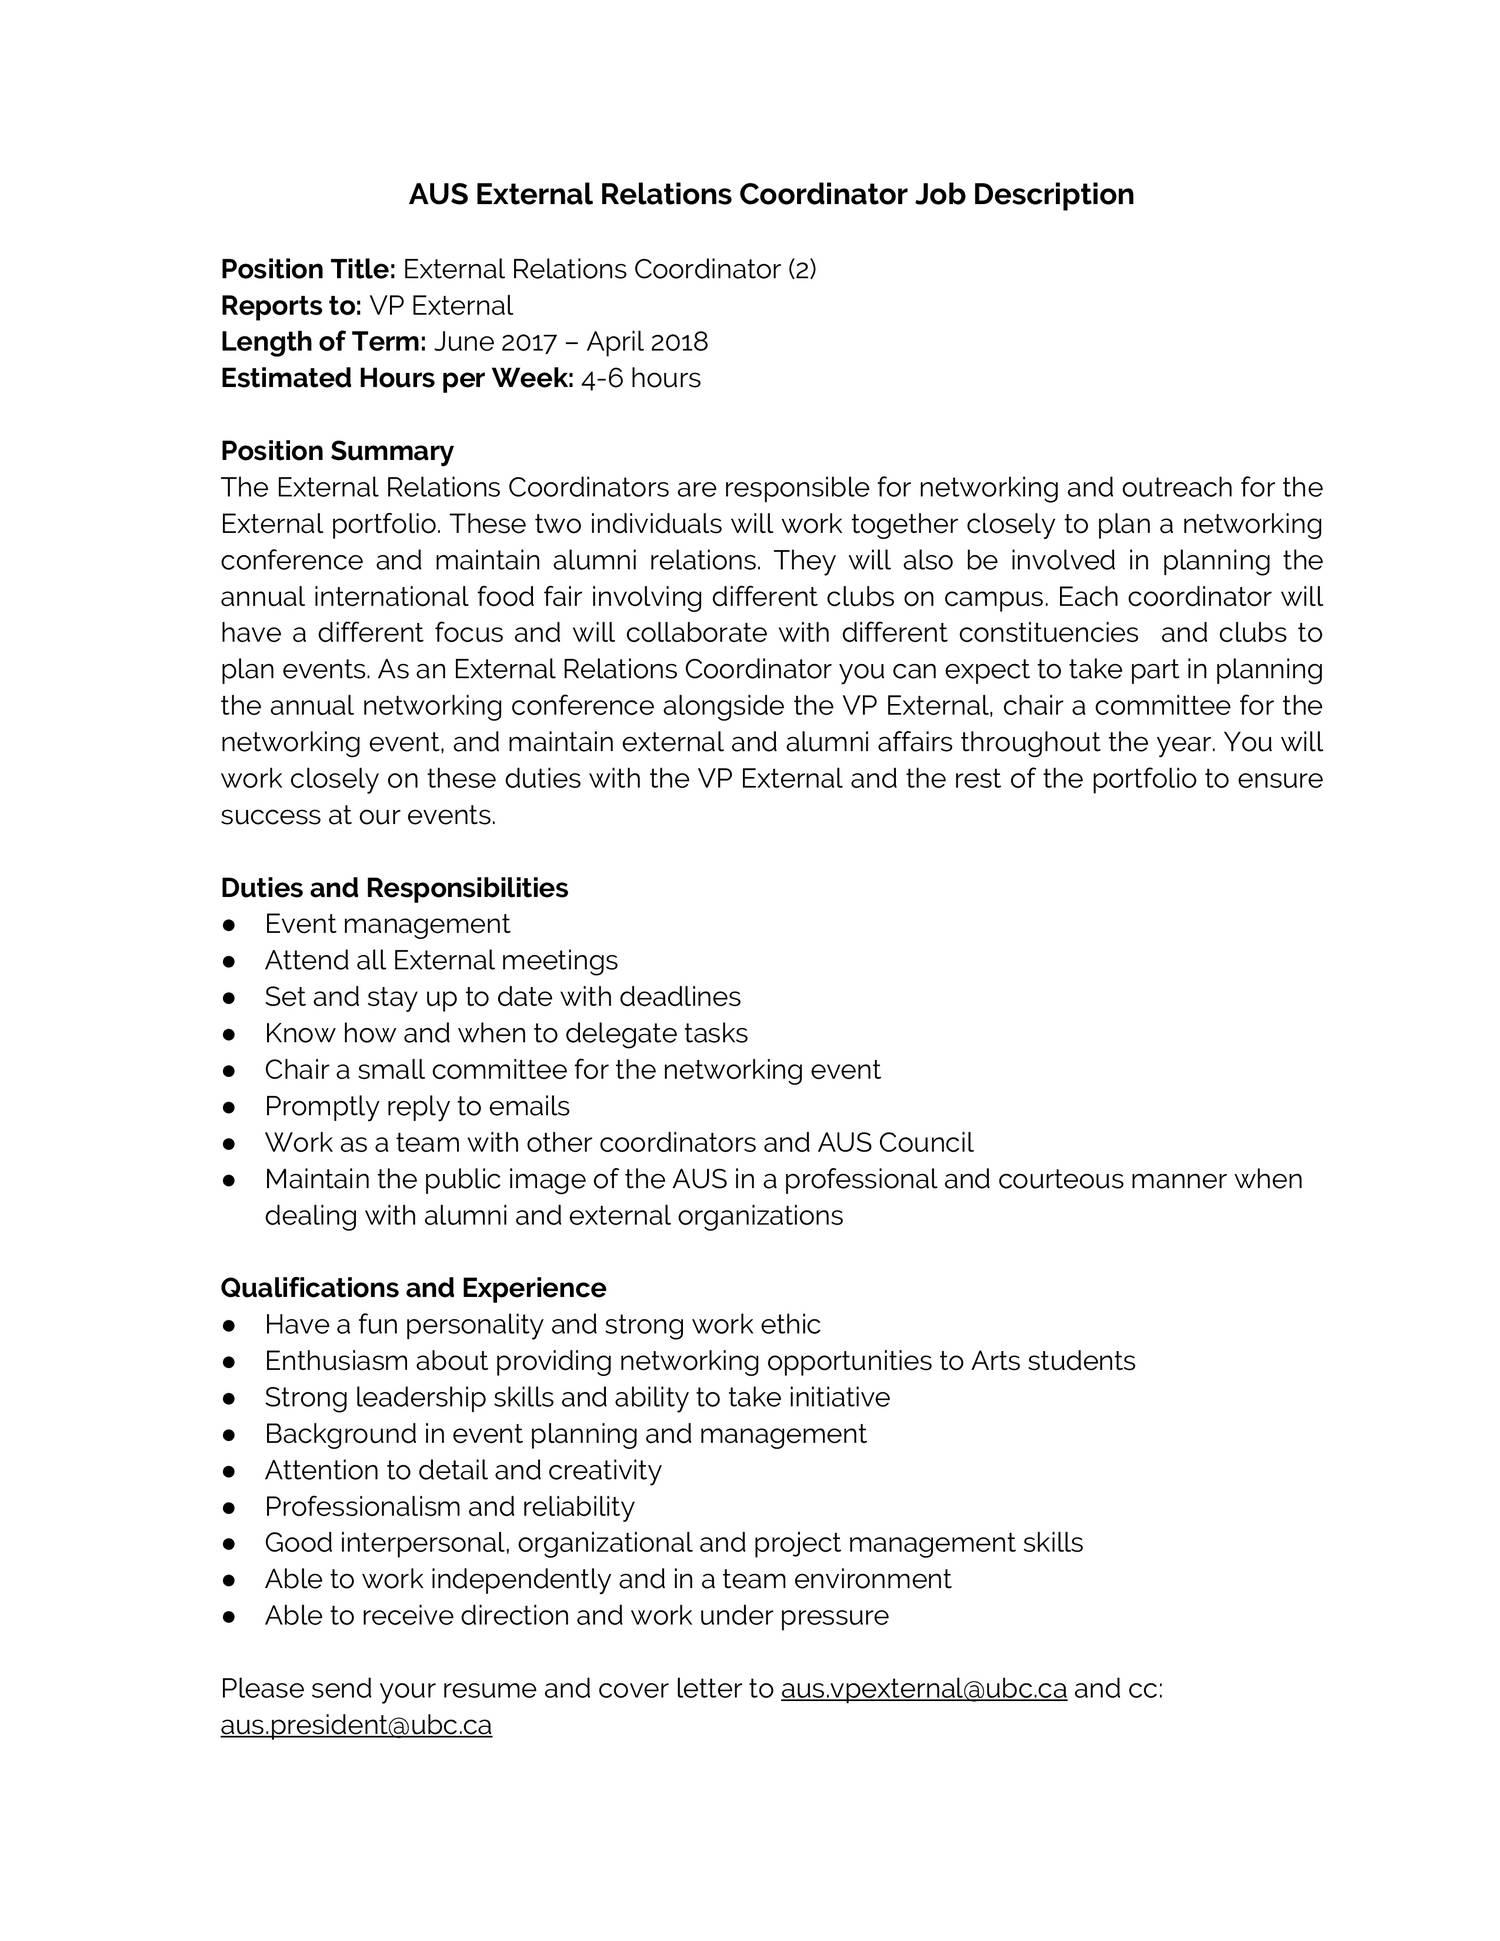 education coordinator job description top 10 education